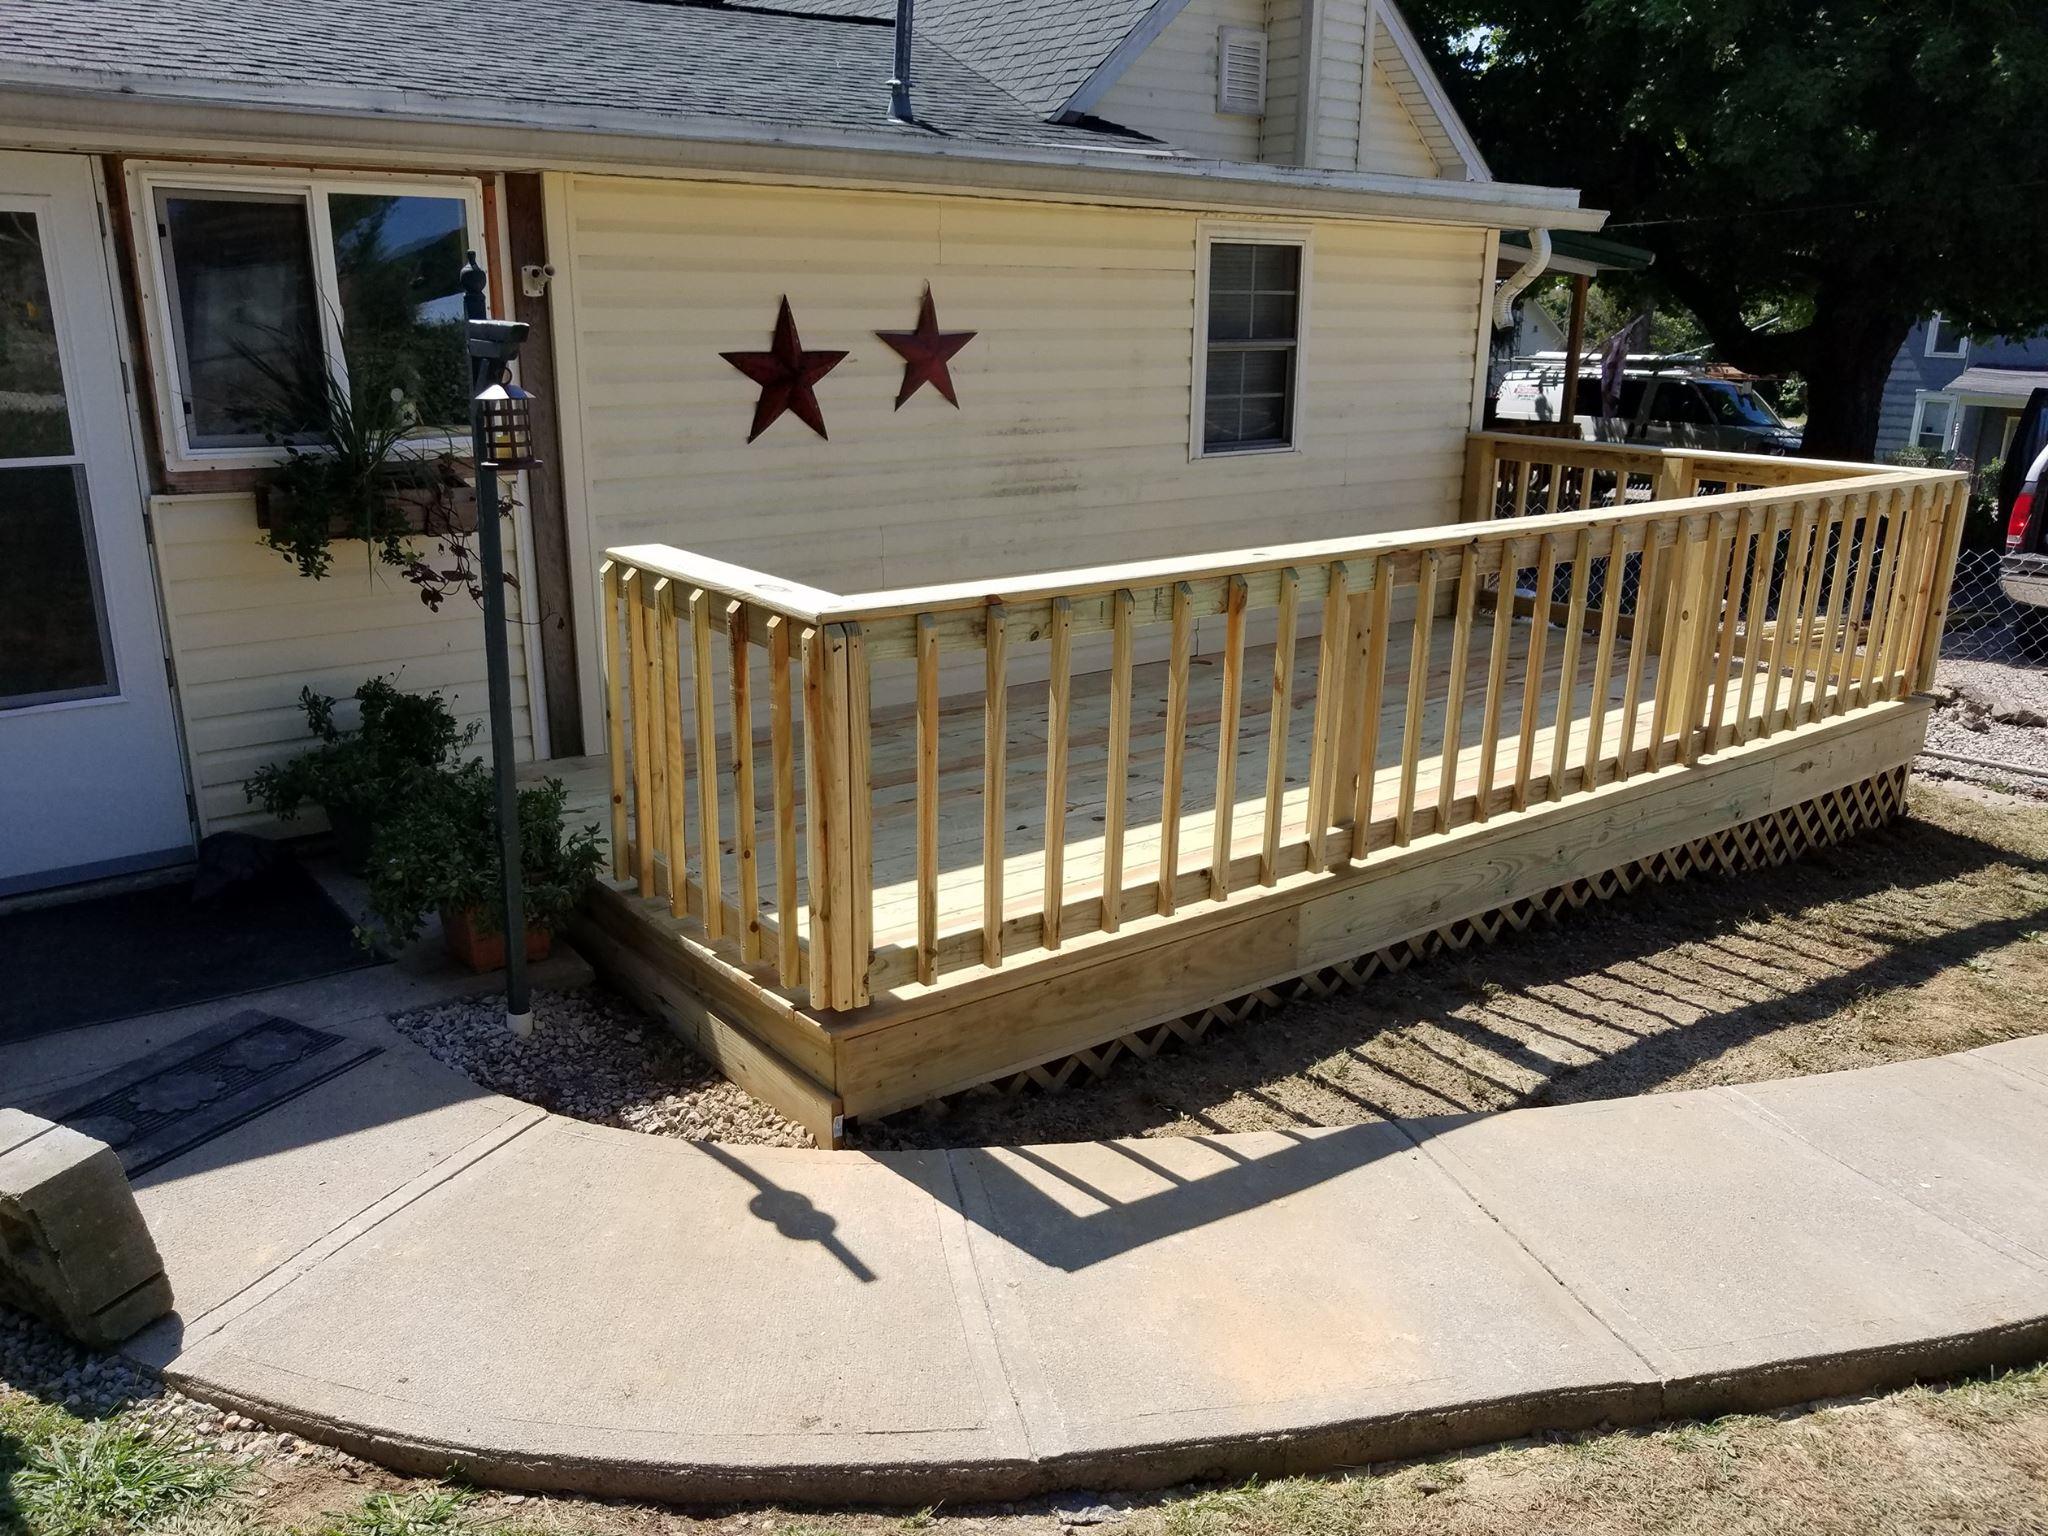 Union Furnace Porch